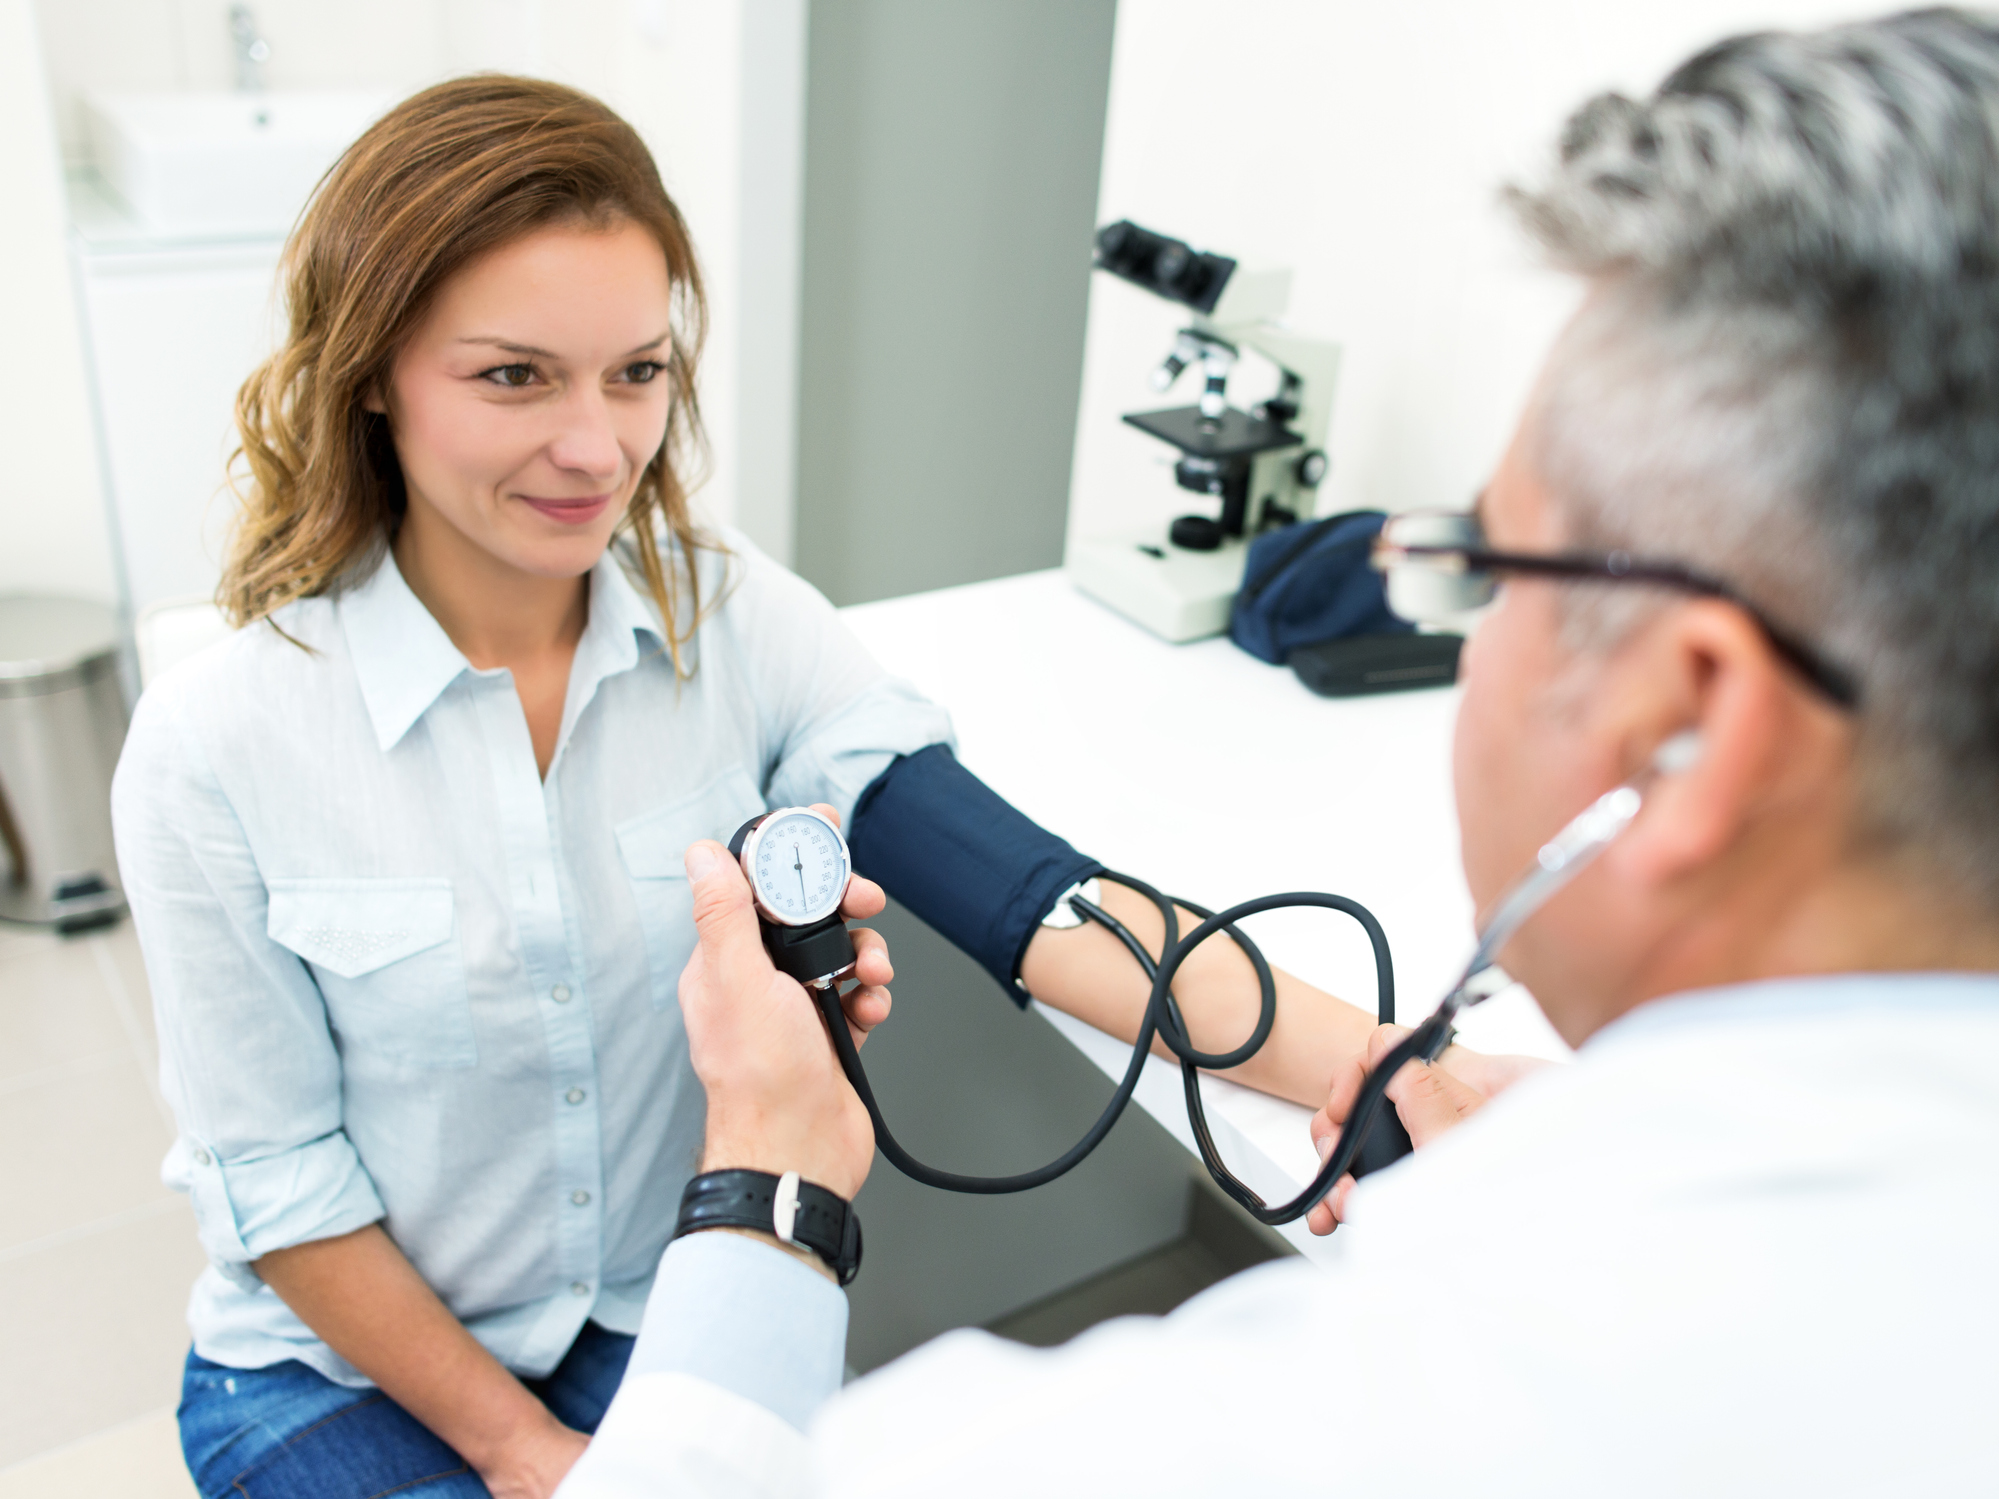 vizarsin magas vérnyomás esetén fizioterápiás gyakorlatok magas vérnyomás